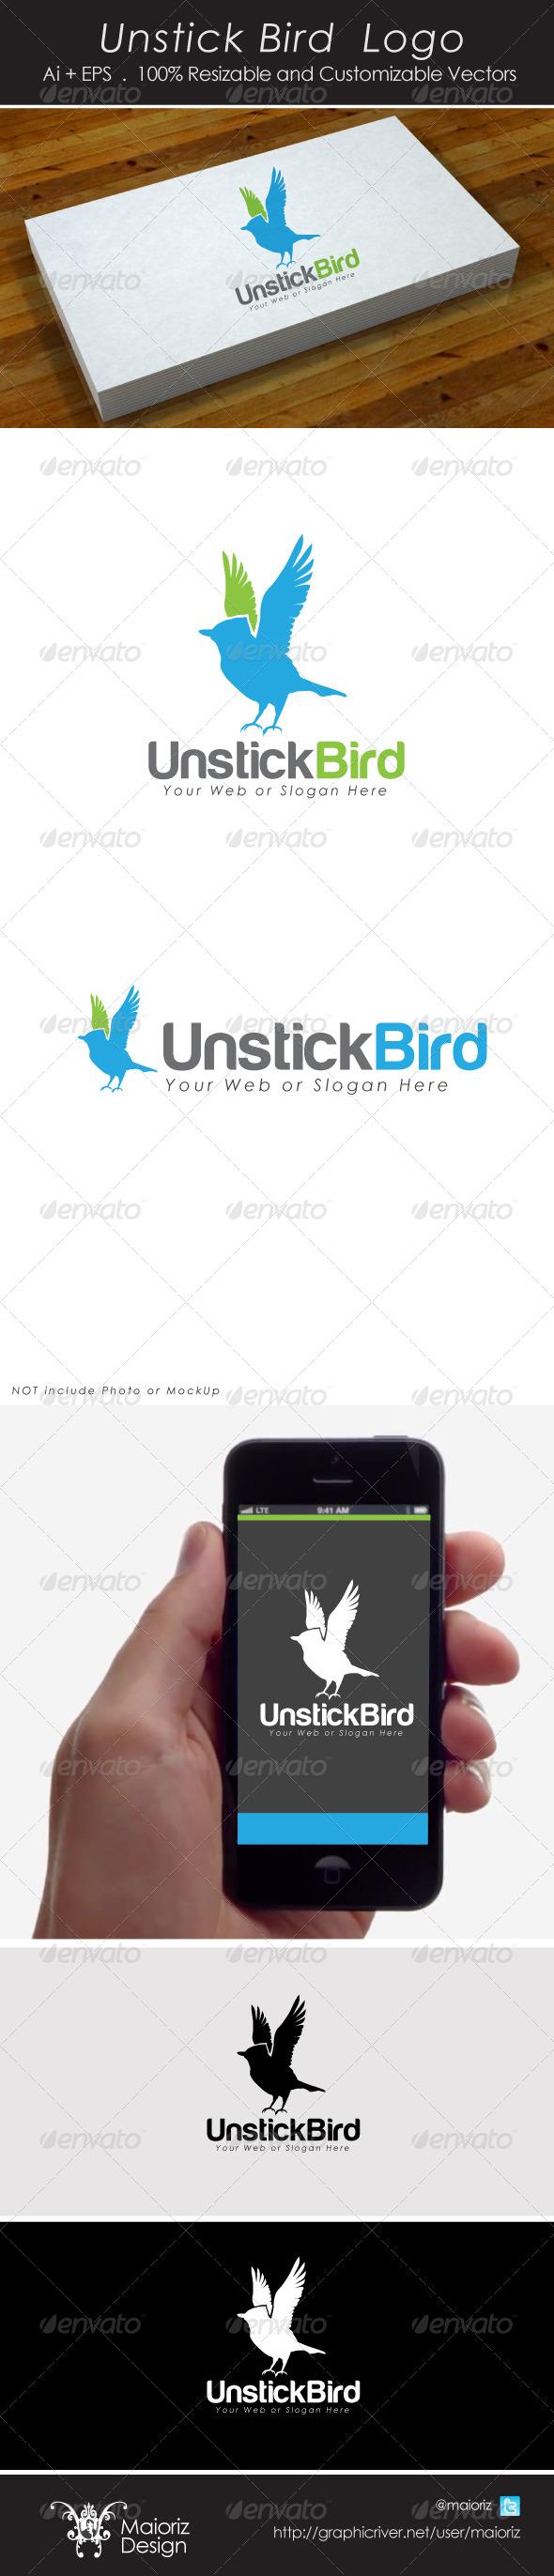 Unstick Bird Logo - Animals Logo Templates